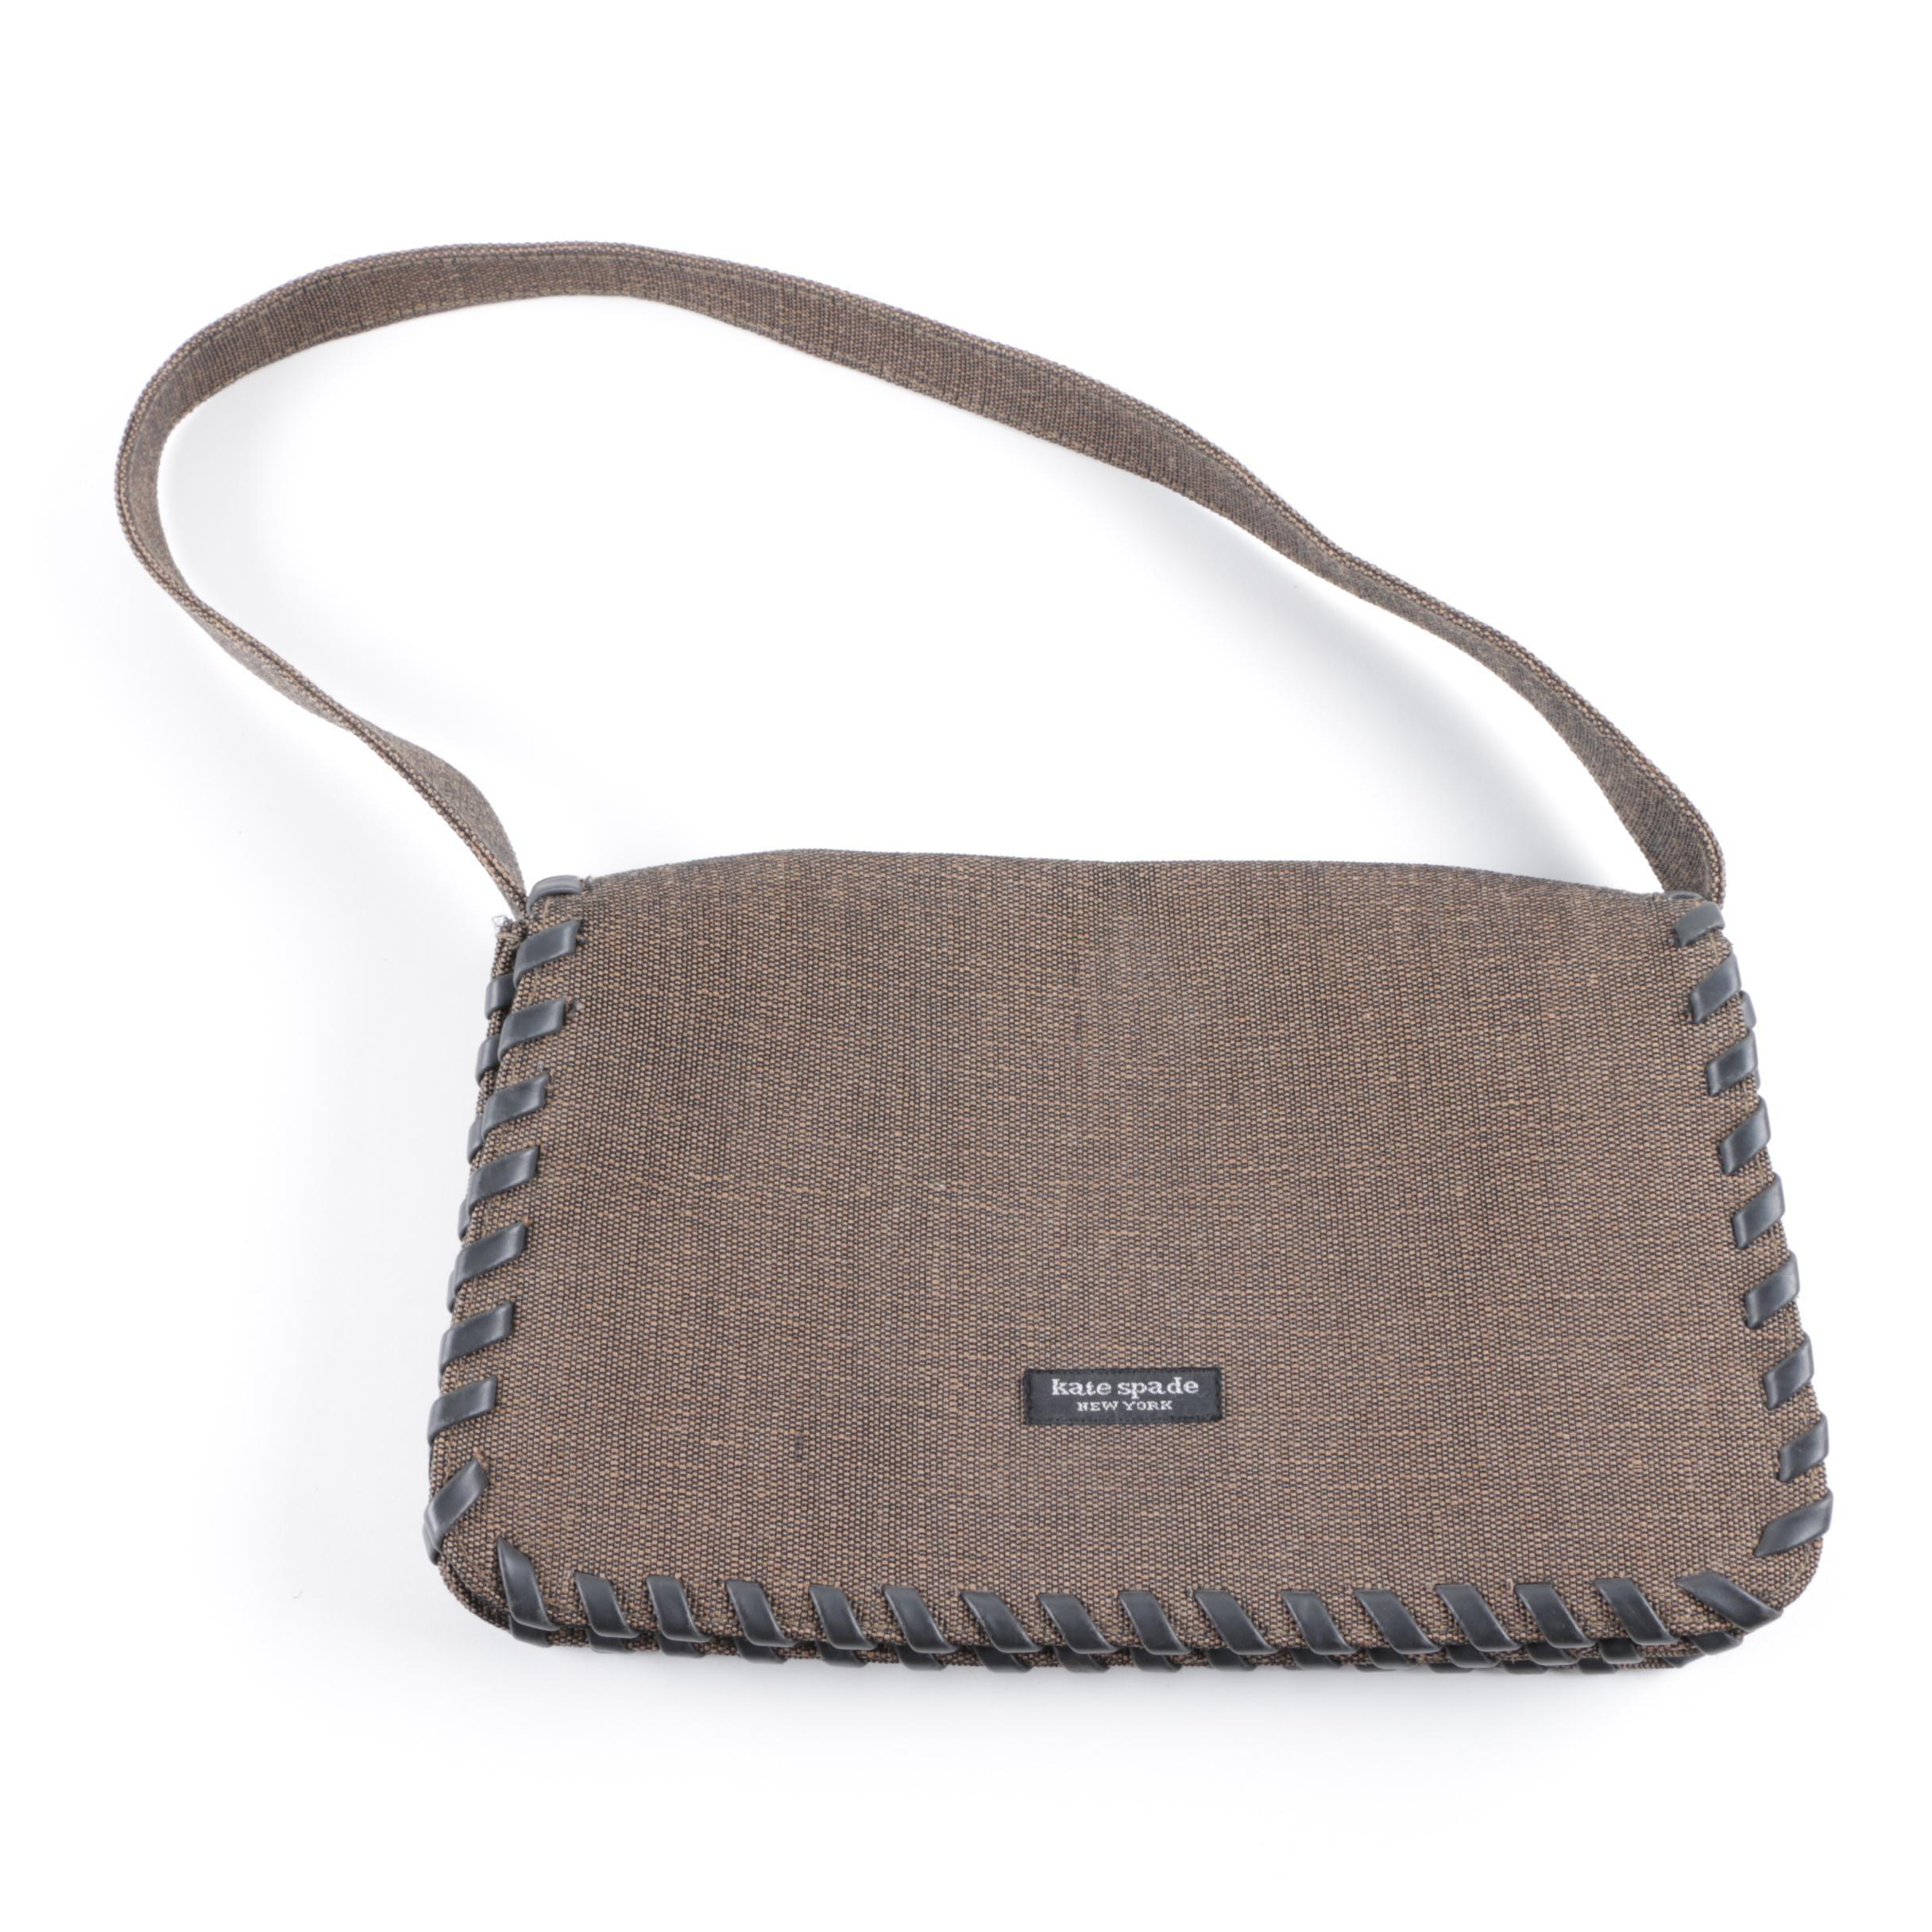 Kate Spade New York Canvas Handbag